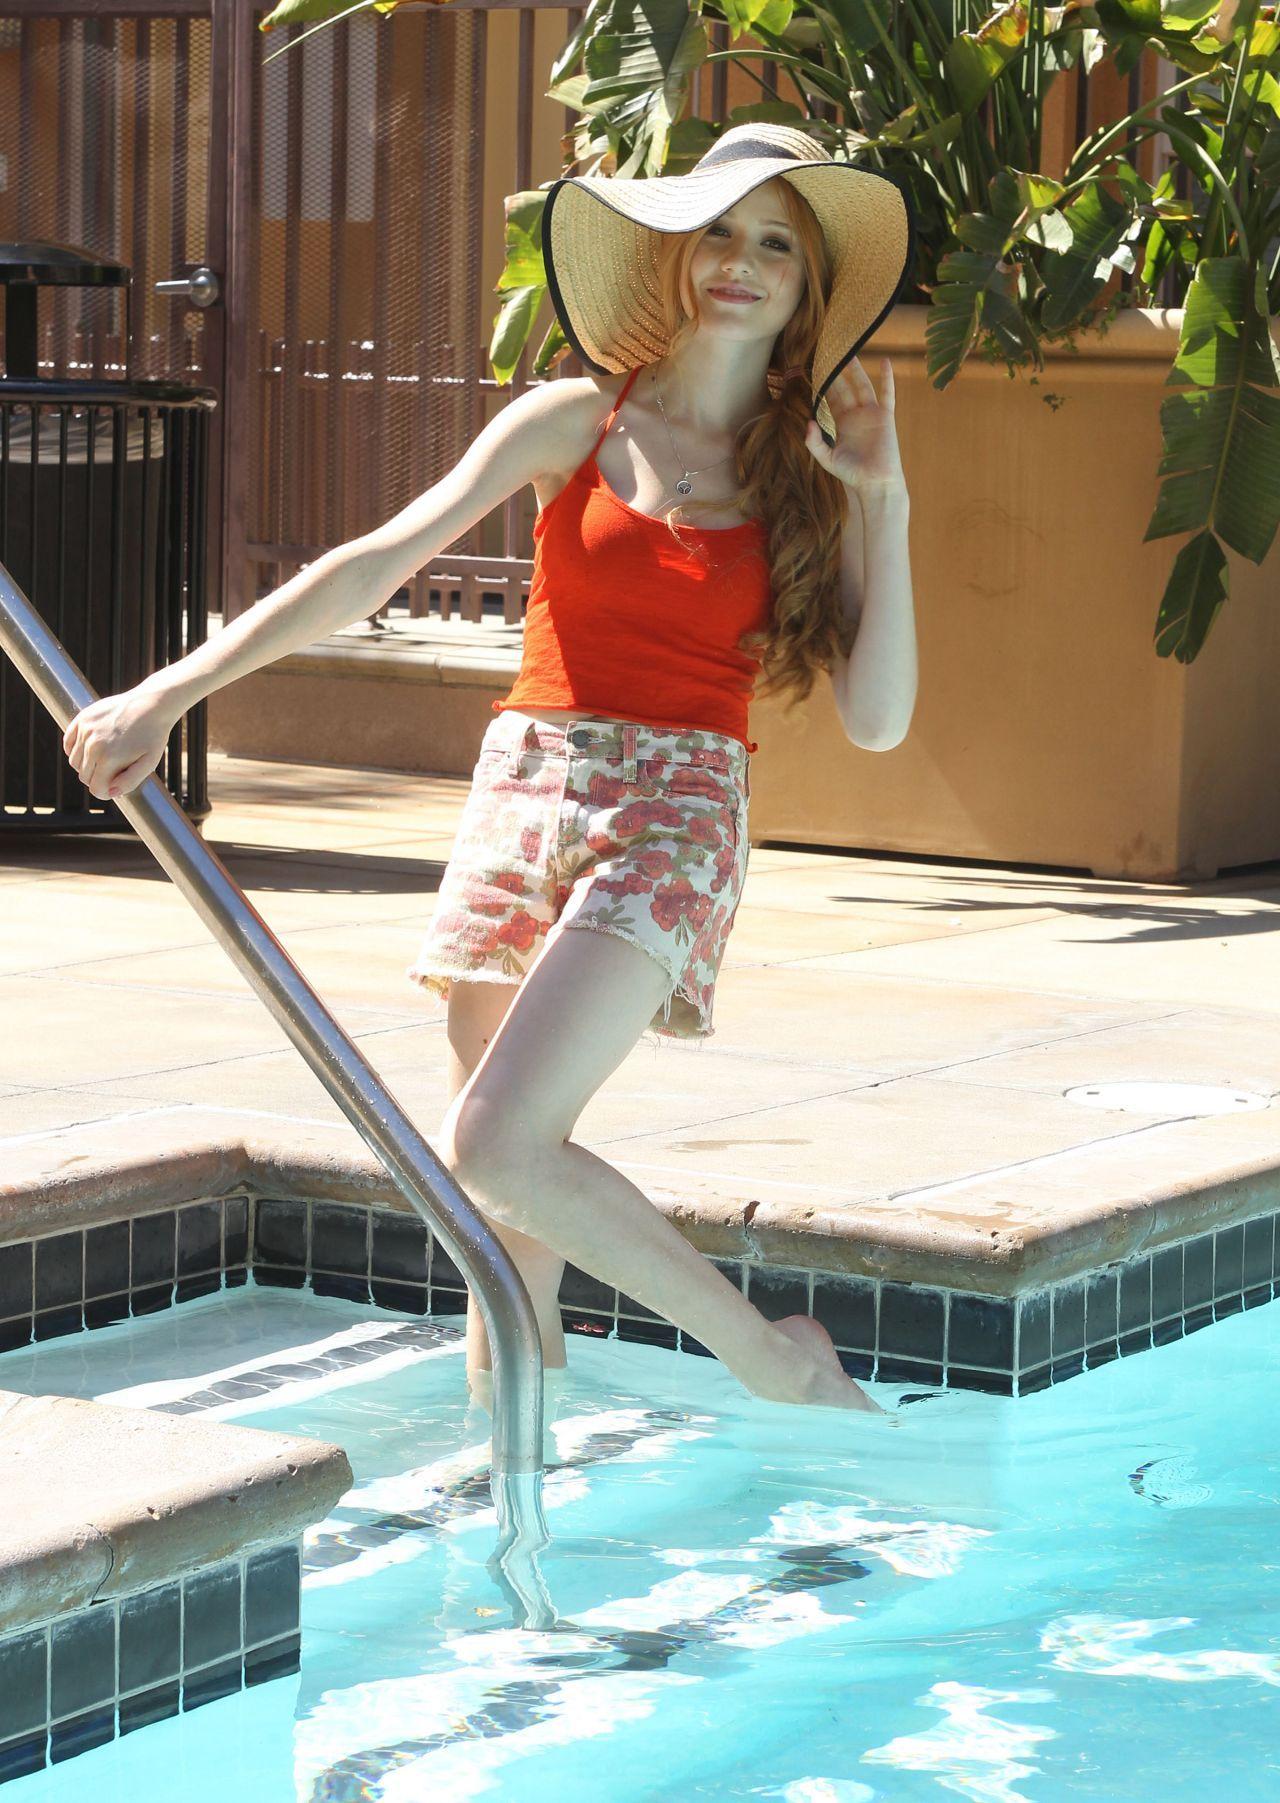 Katherine Mcnamara Photoshoot By A Pool In Los Angeles September 2014 Katherine Mcnamara Photoshoot Katherine